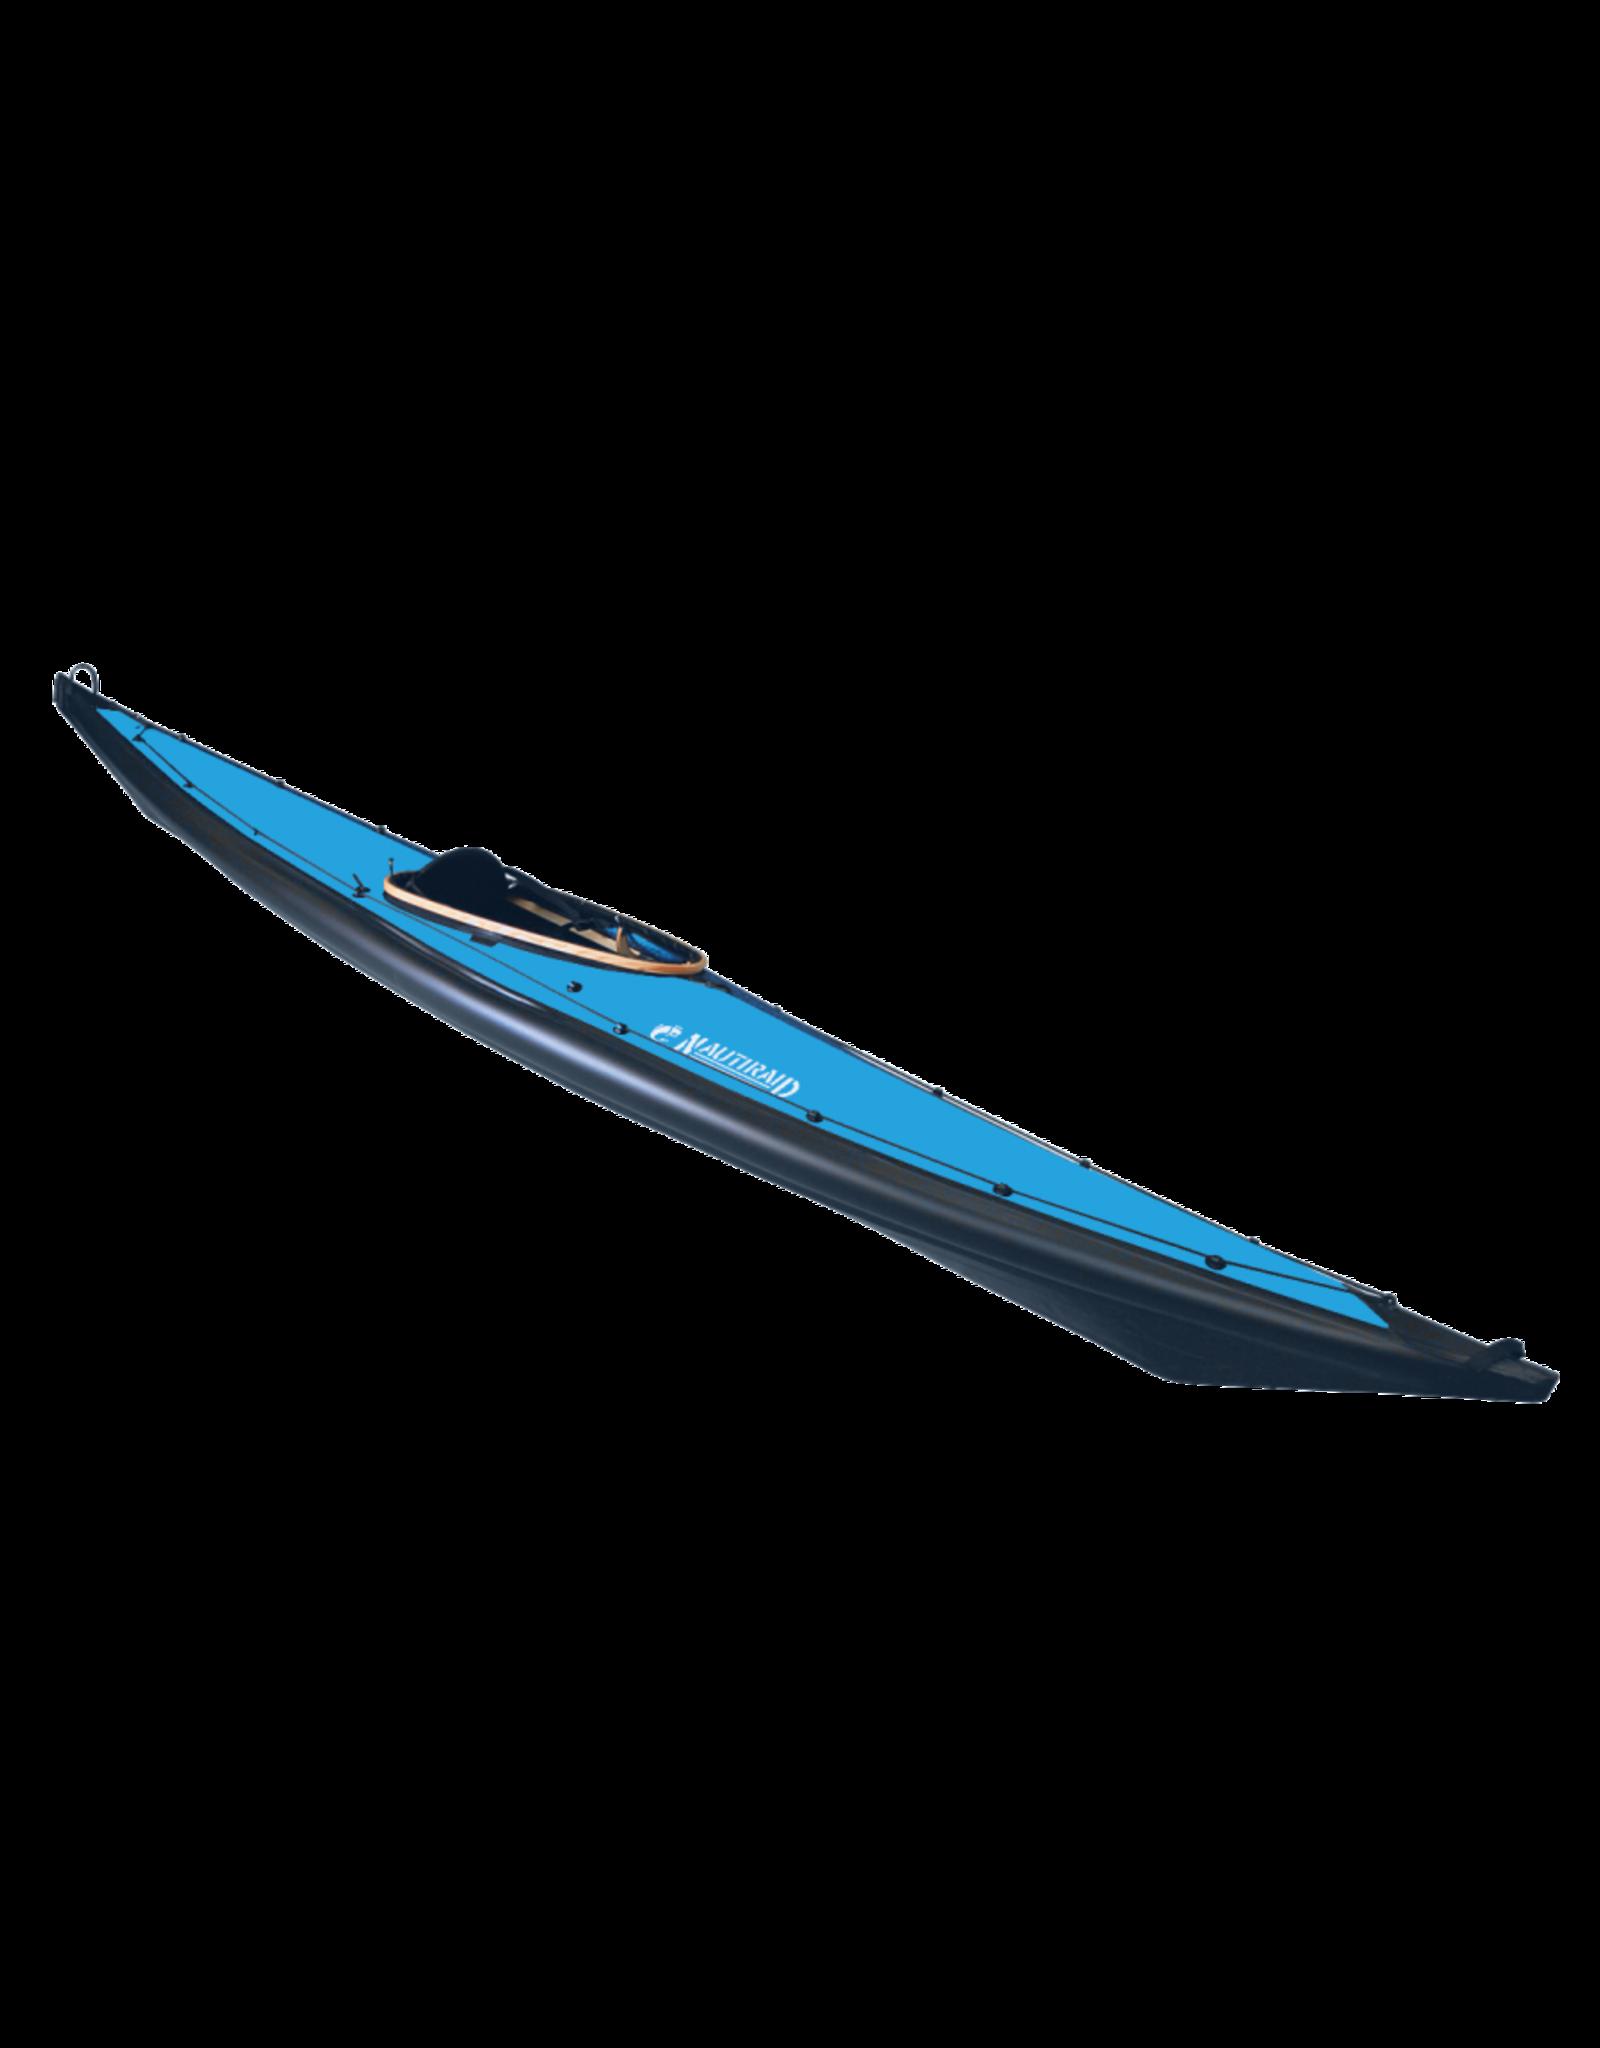 Nautiraid Nautiraid kayak NARAK 460 Bois PVC Monoplace + Pack Evasion + Foot Pegs